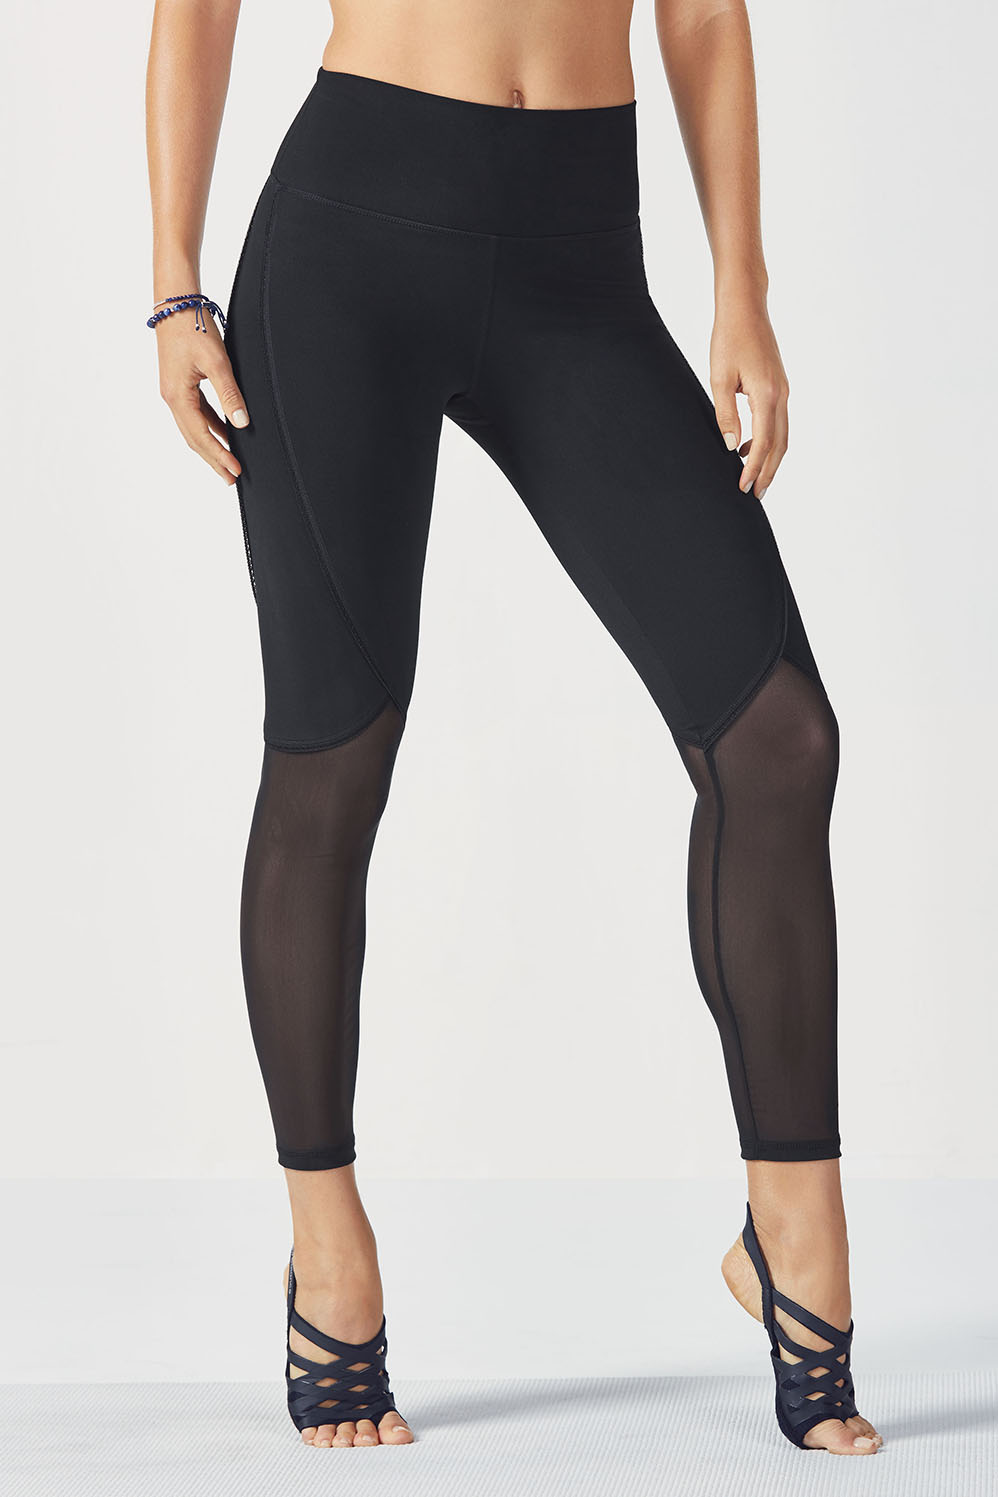 Fabletics Leggings High-Waisted Mesh Powerhold 7/8 Womens Black Size M